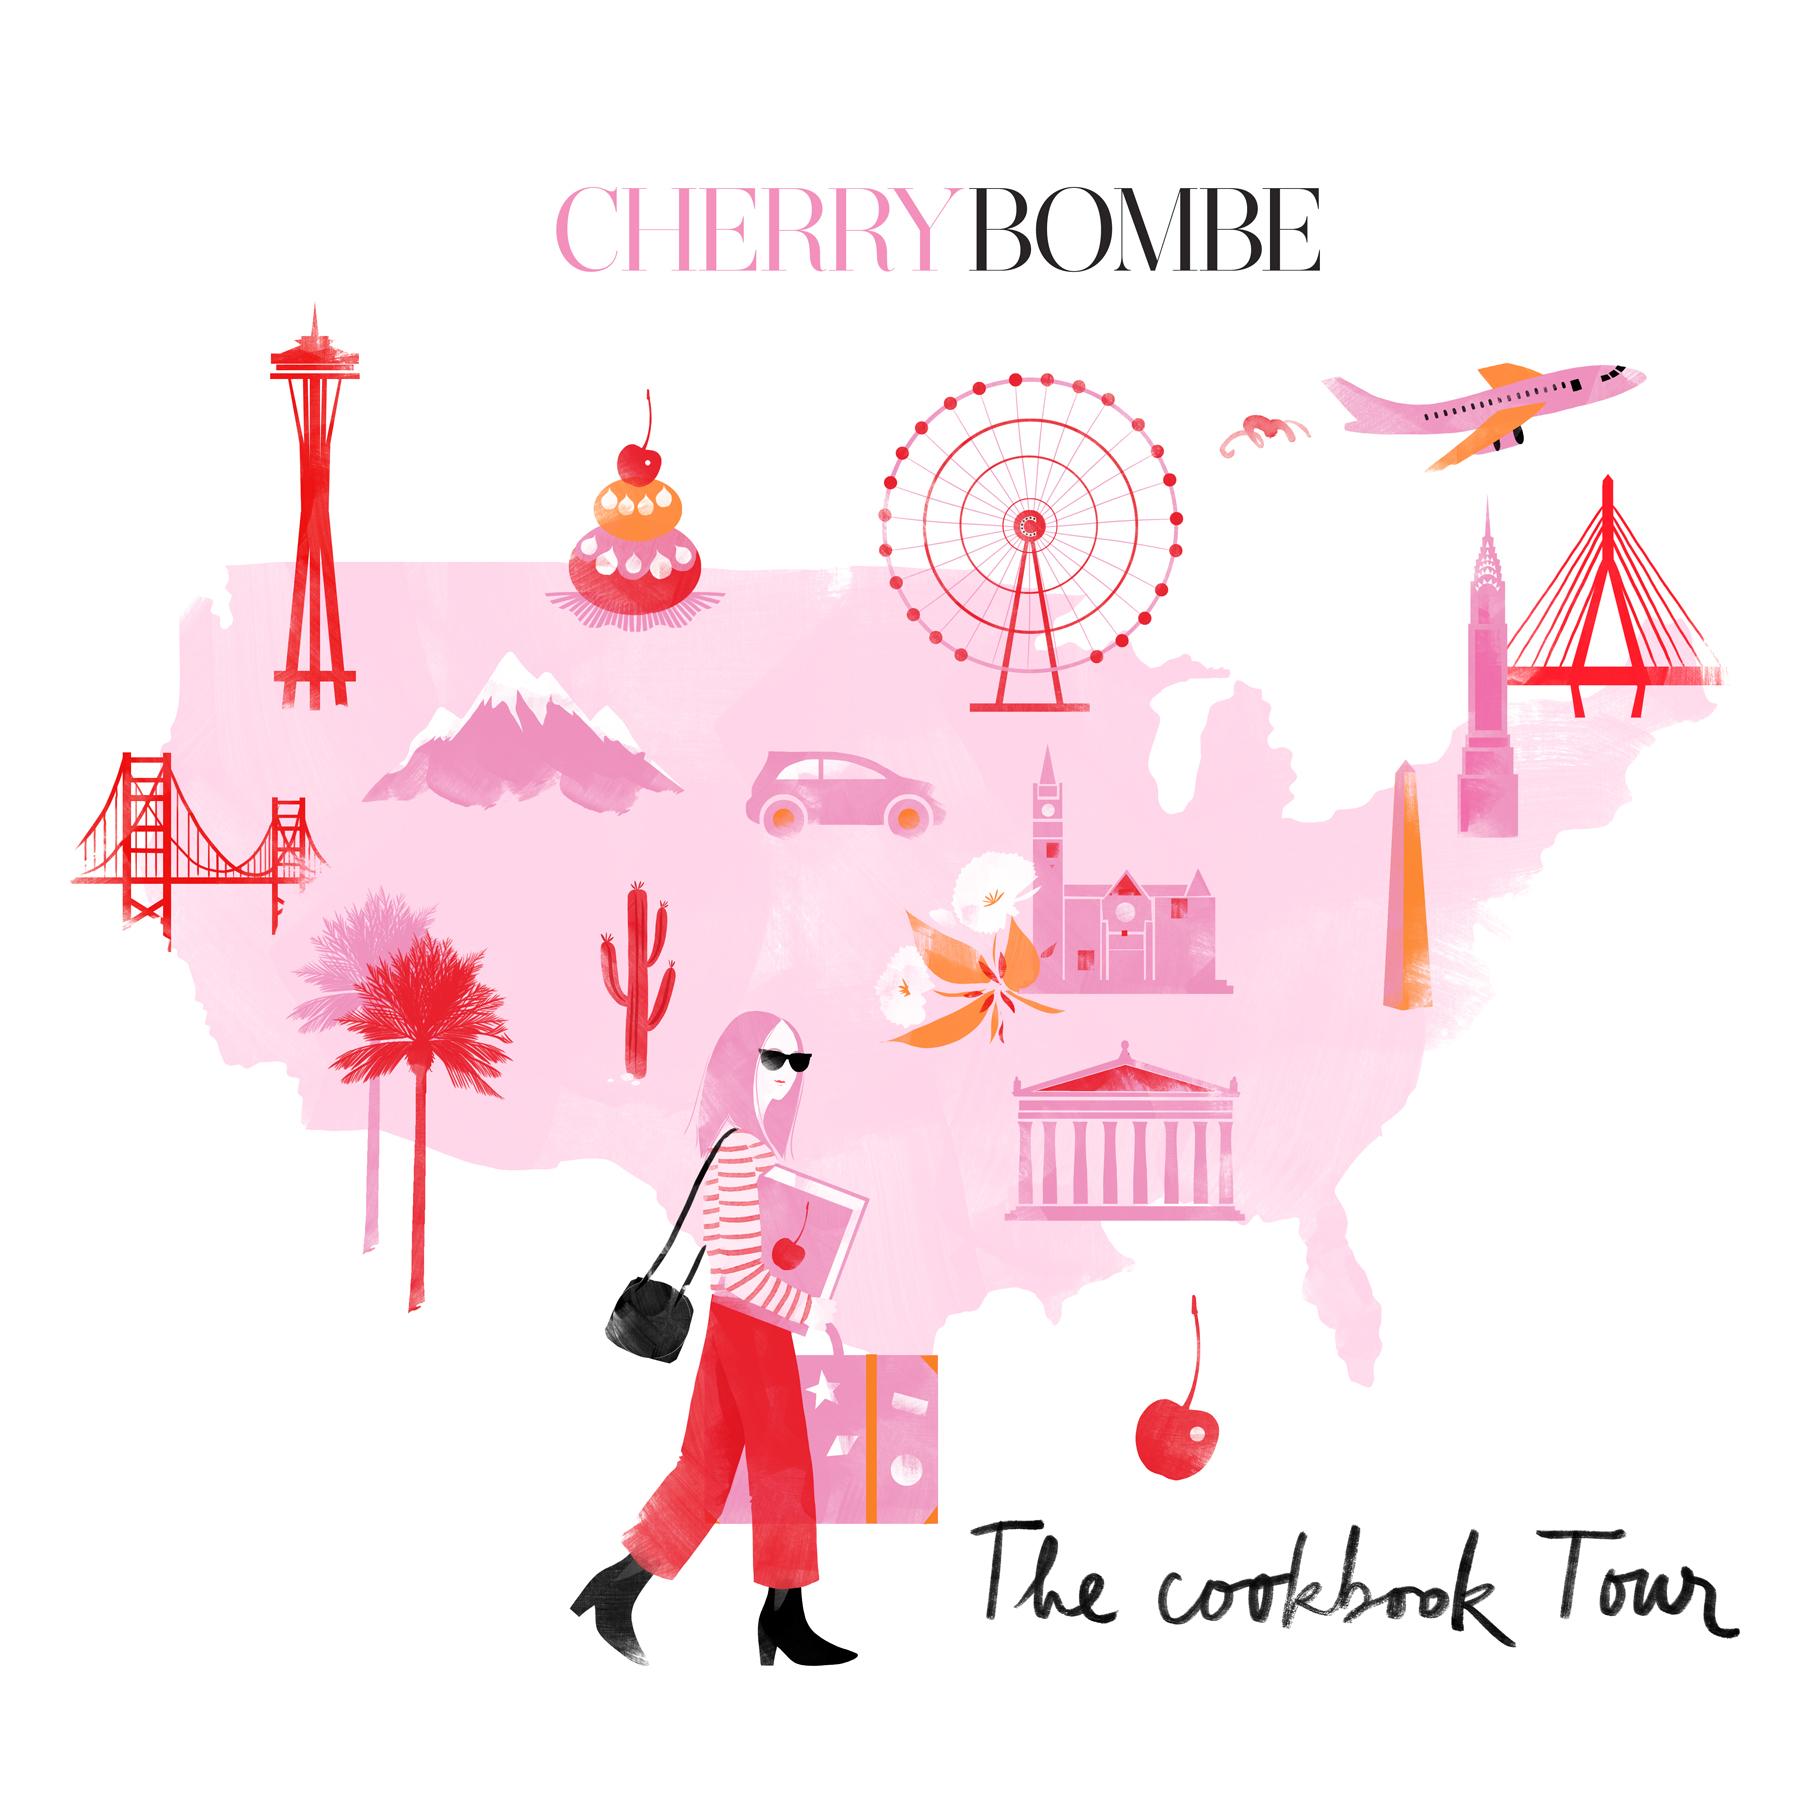 cherryB-cookbookTour-Layered_FINAL.jpg